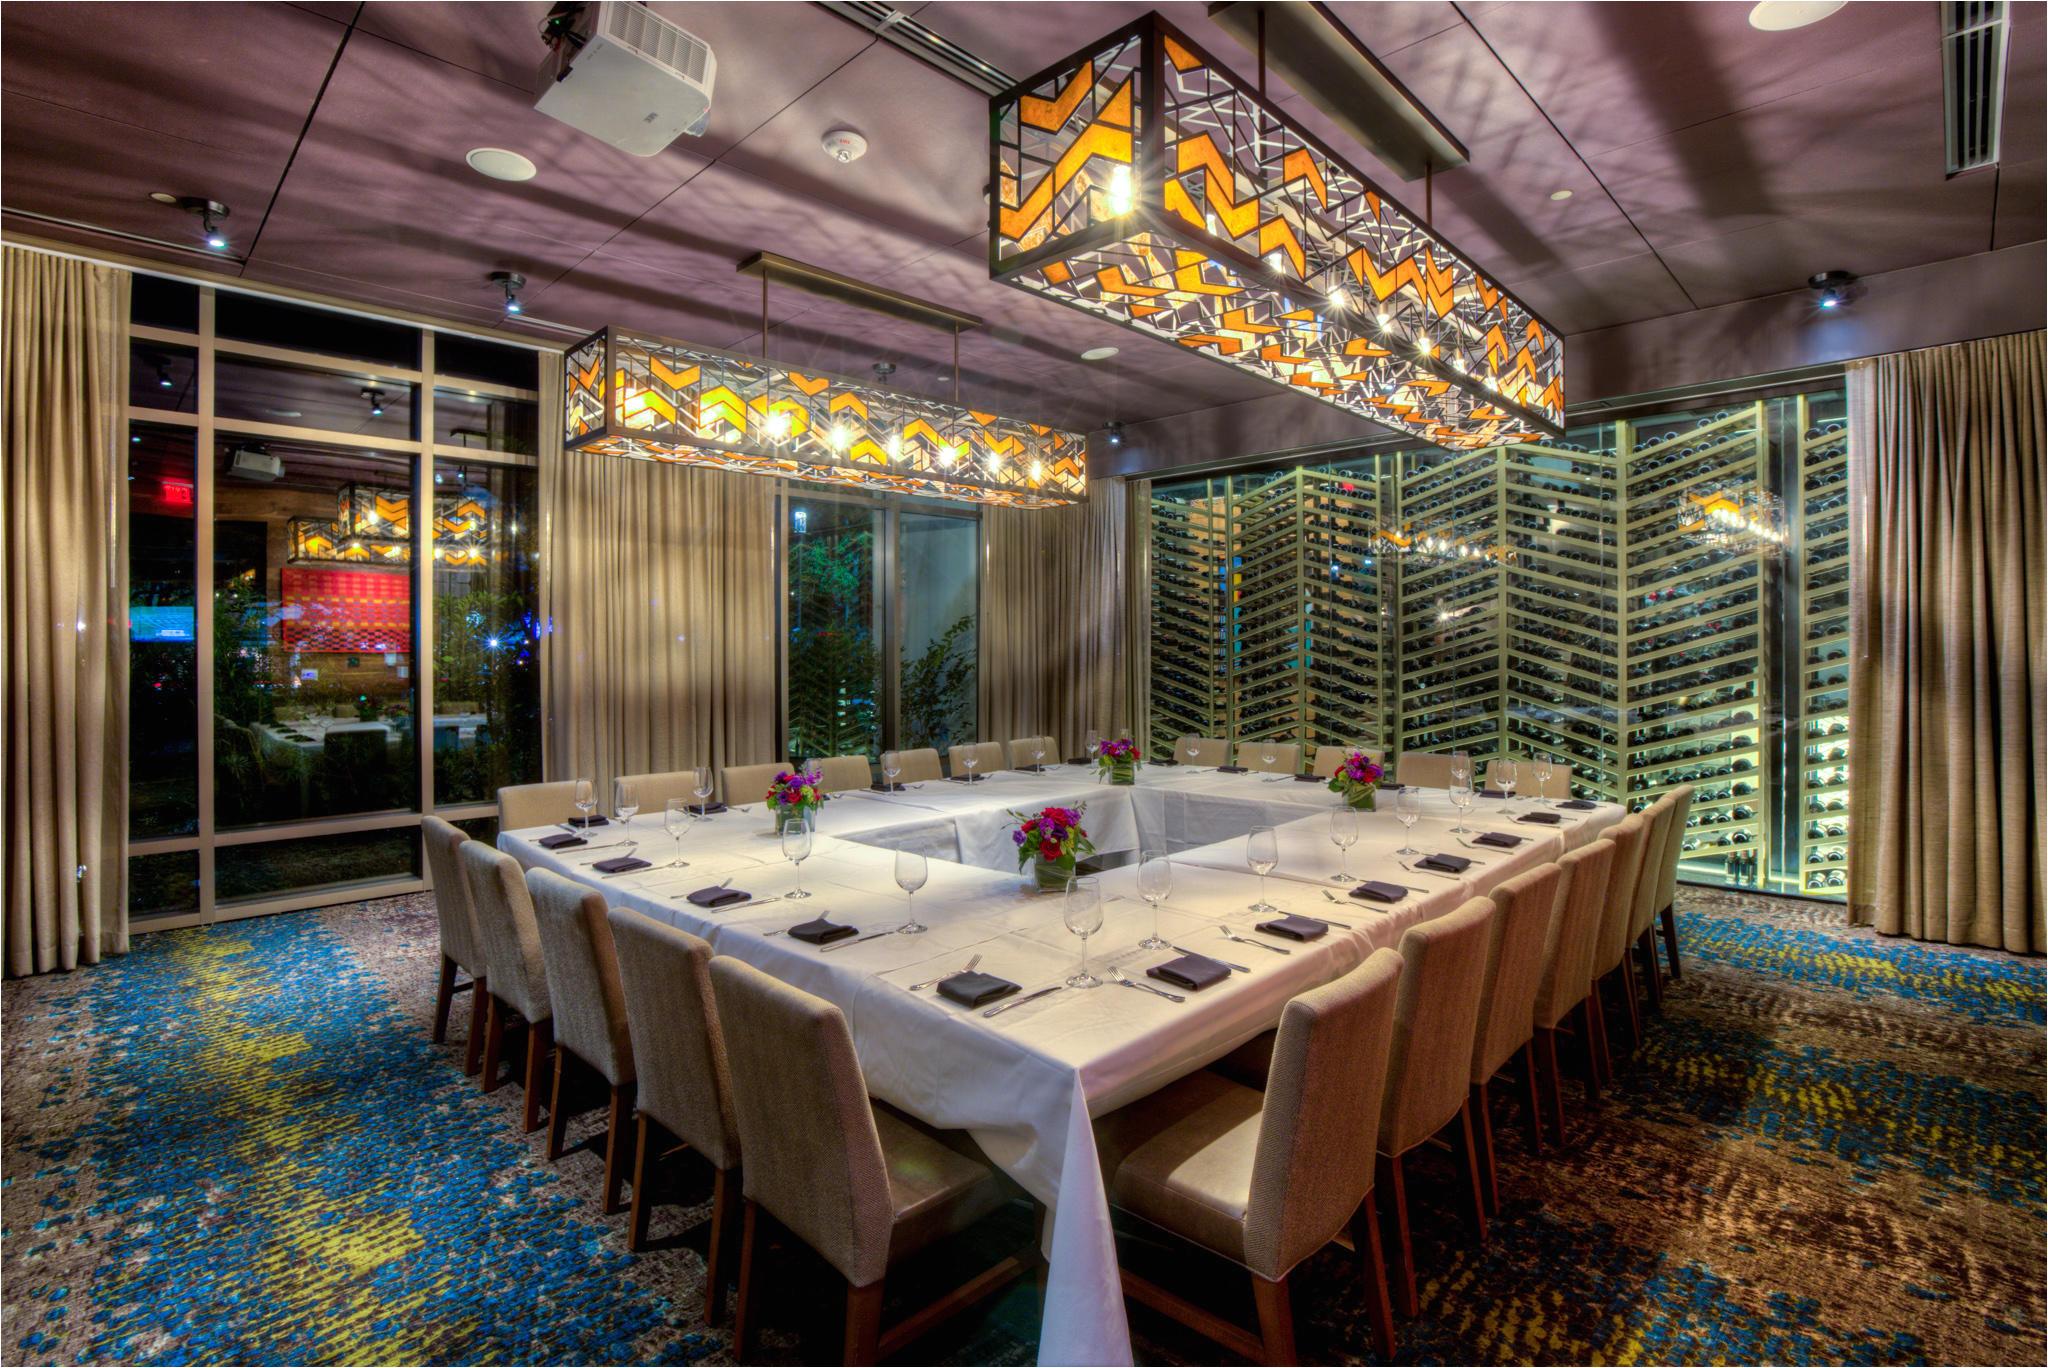 del frisco s double eagle steakhouse orlando barrel room half cellar private dining room